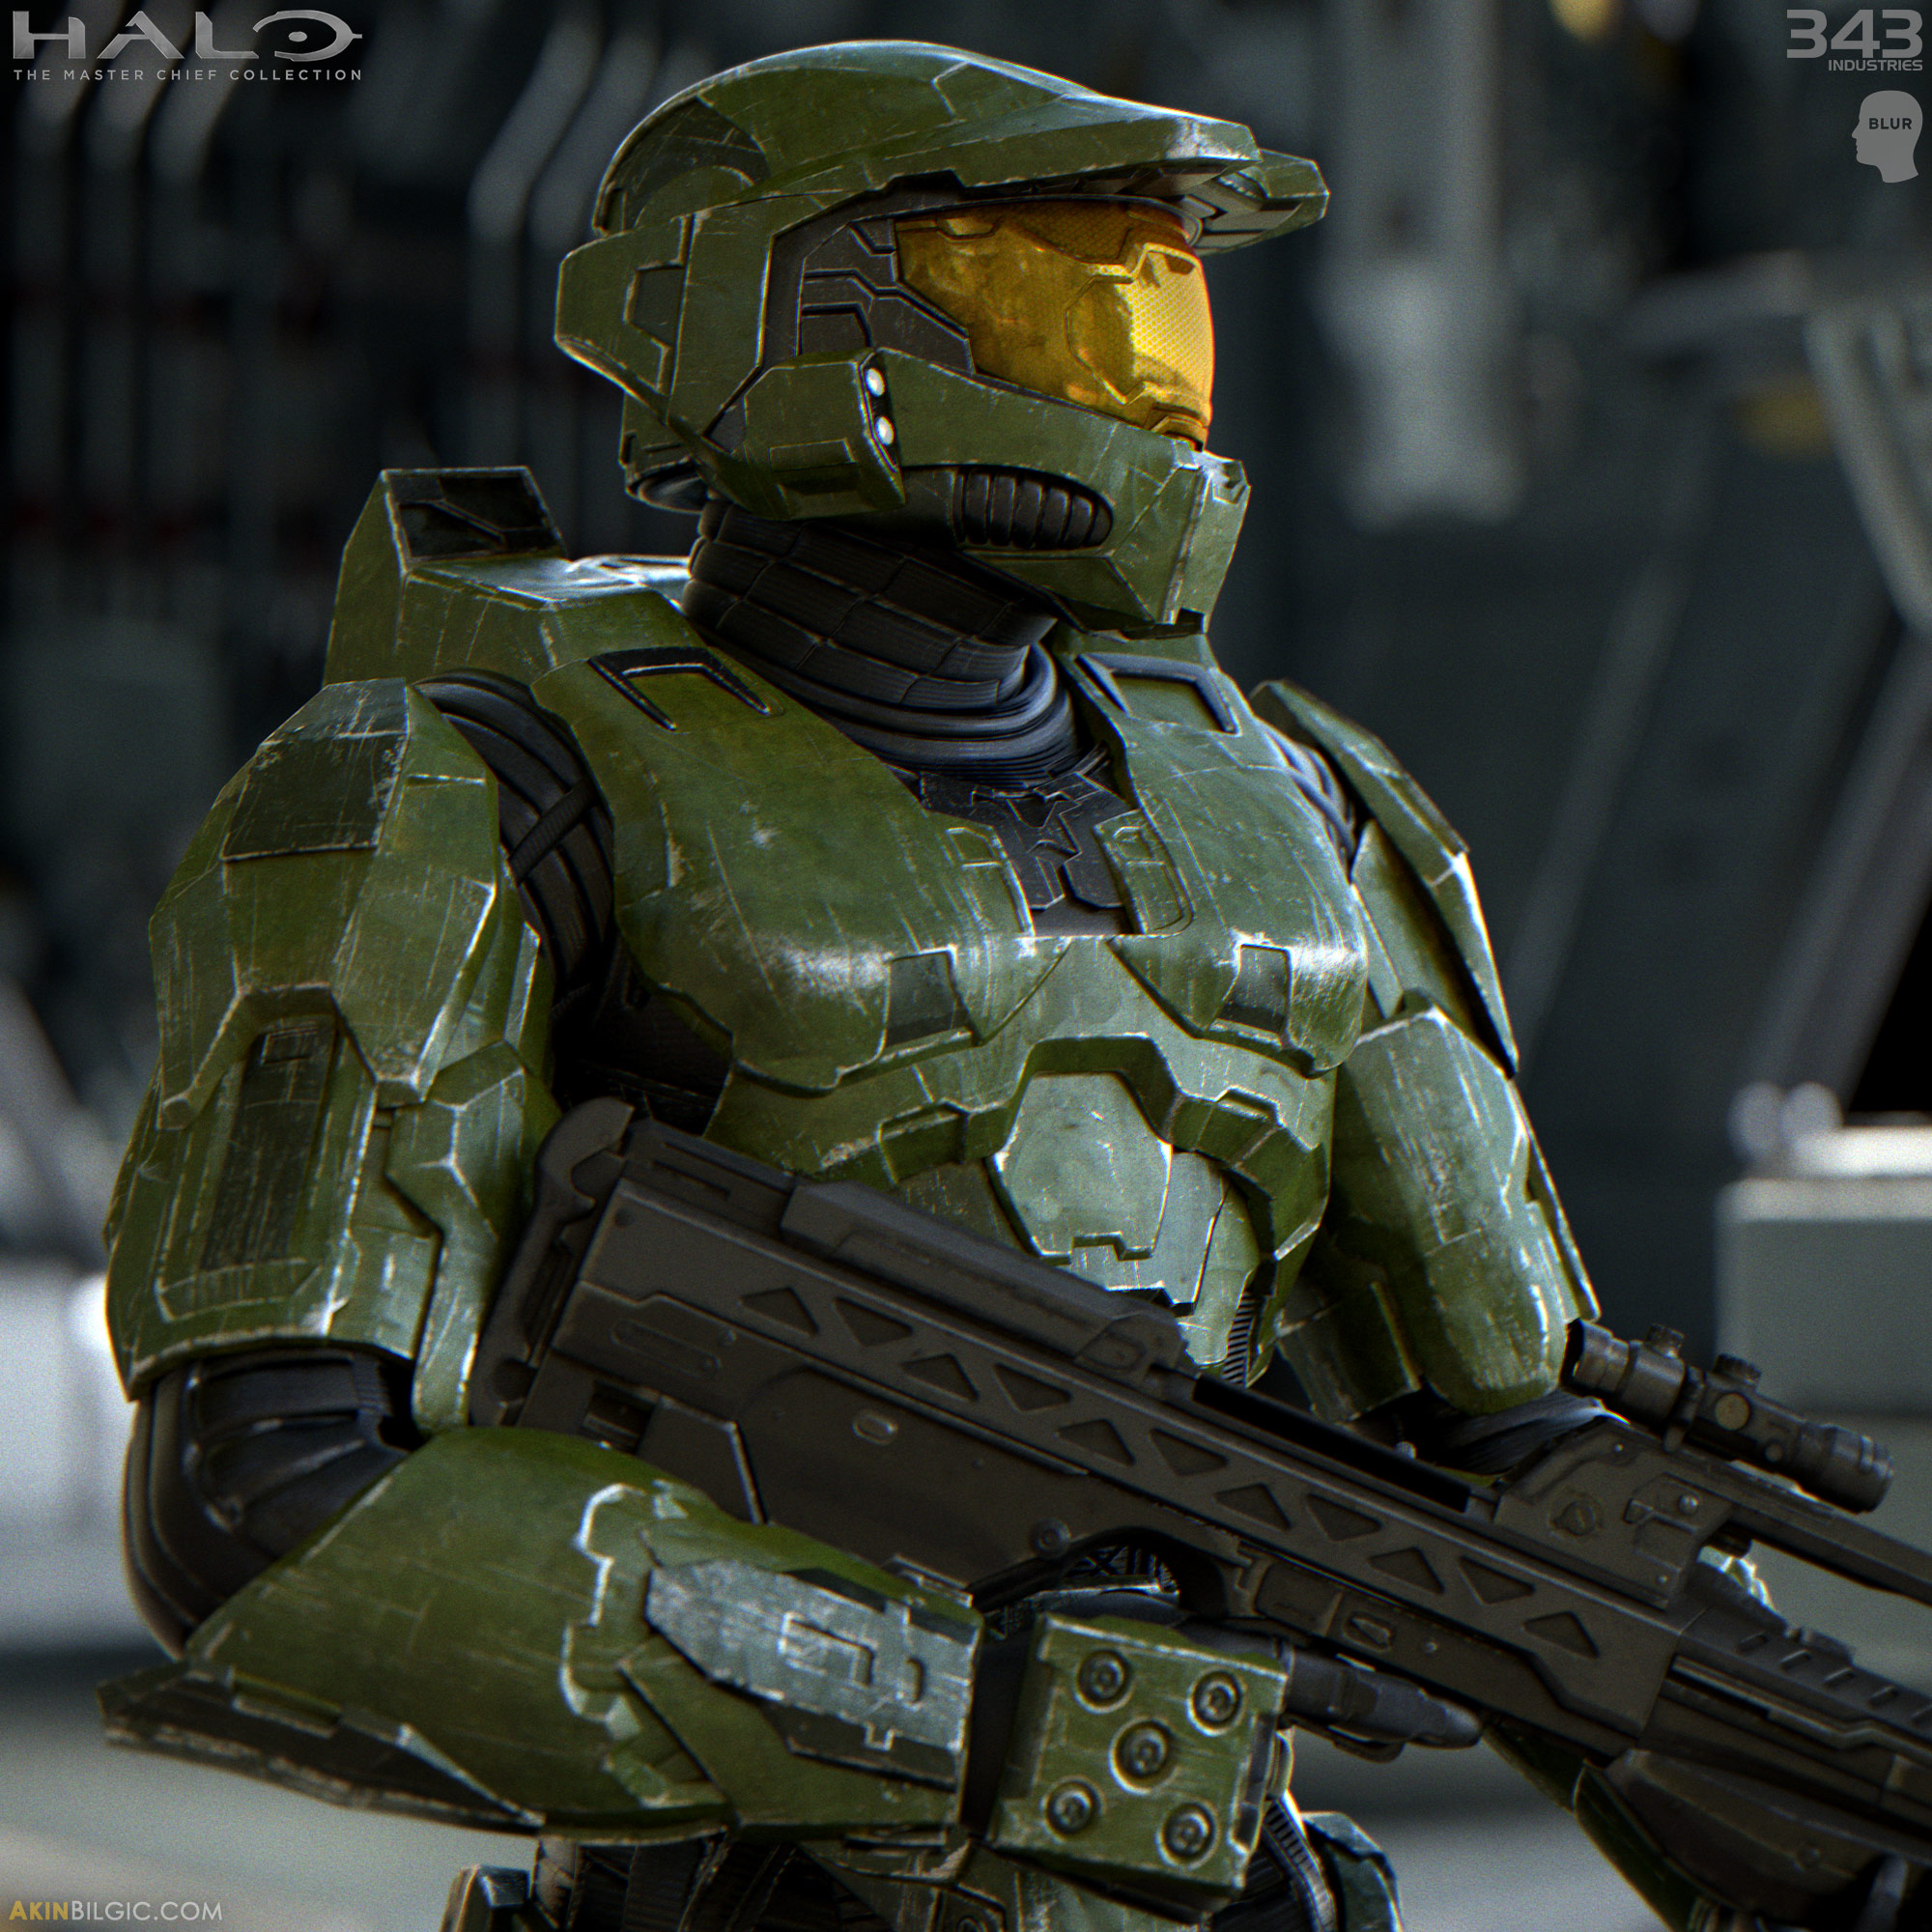 Halo Live Wallpaper: CG Modeler / Generalist